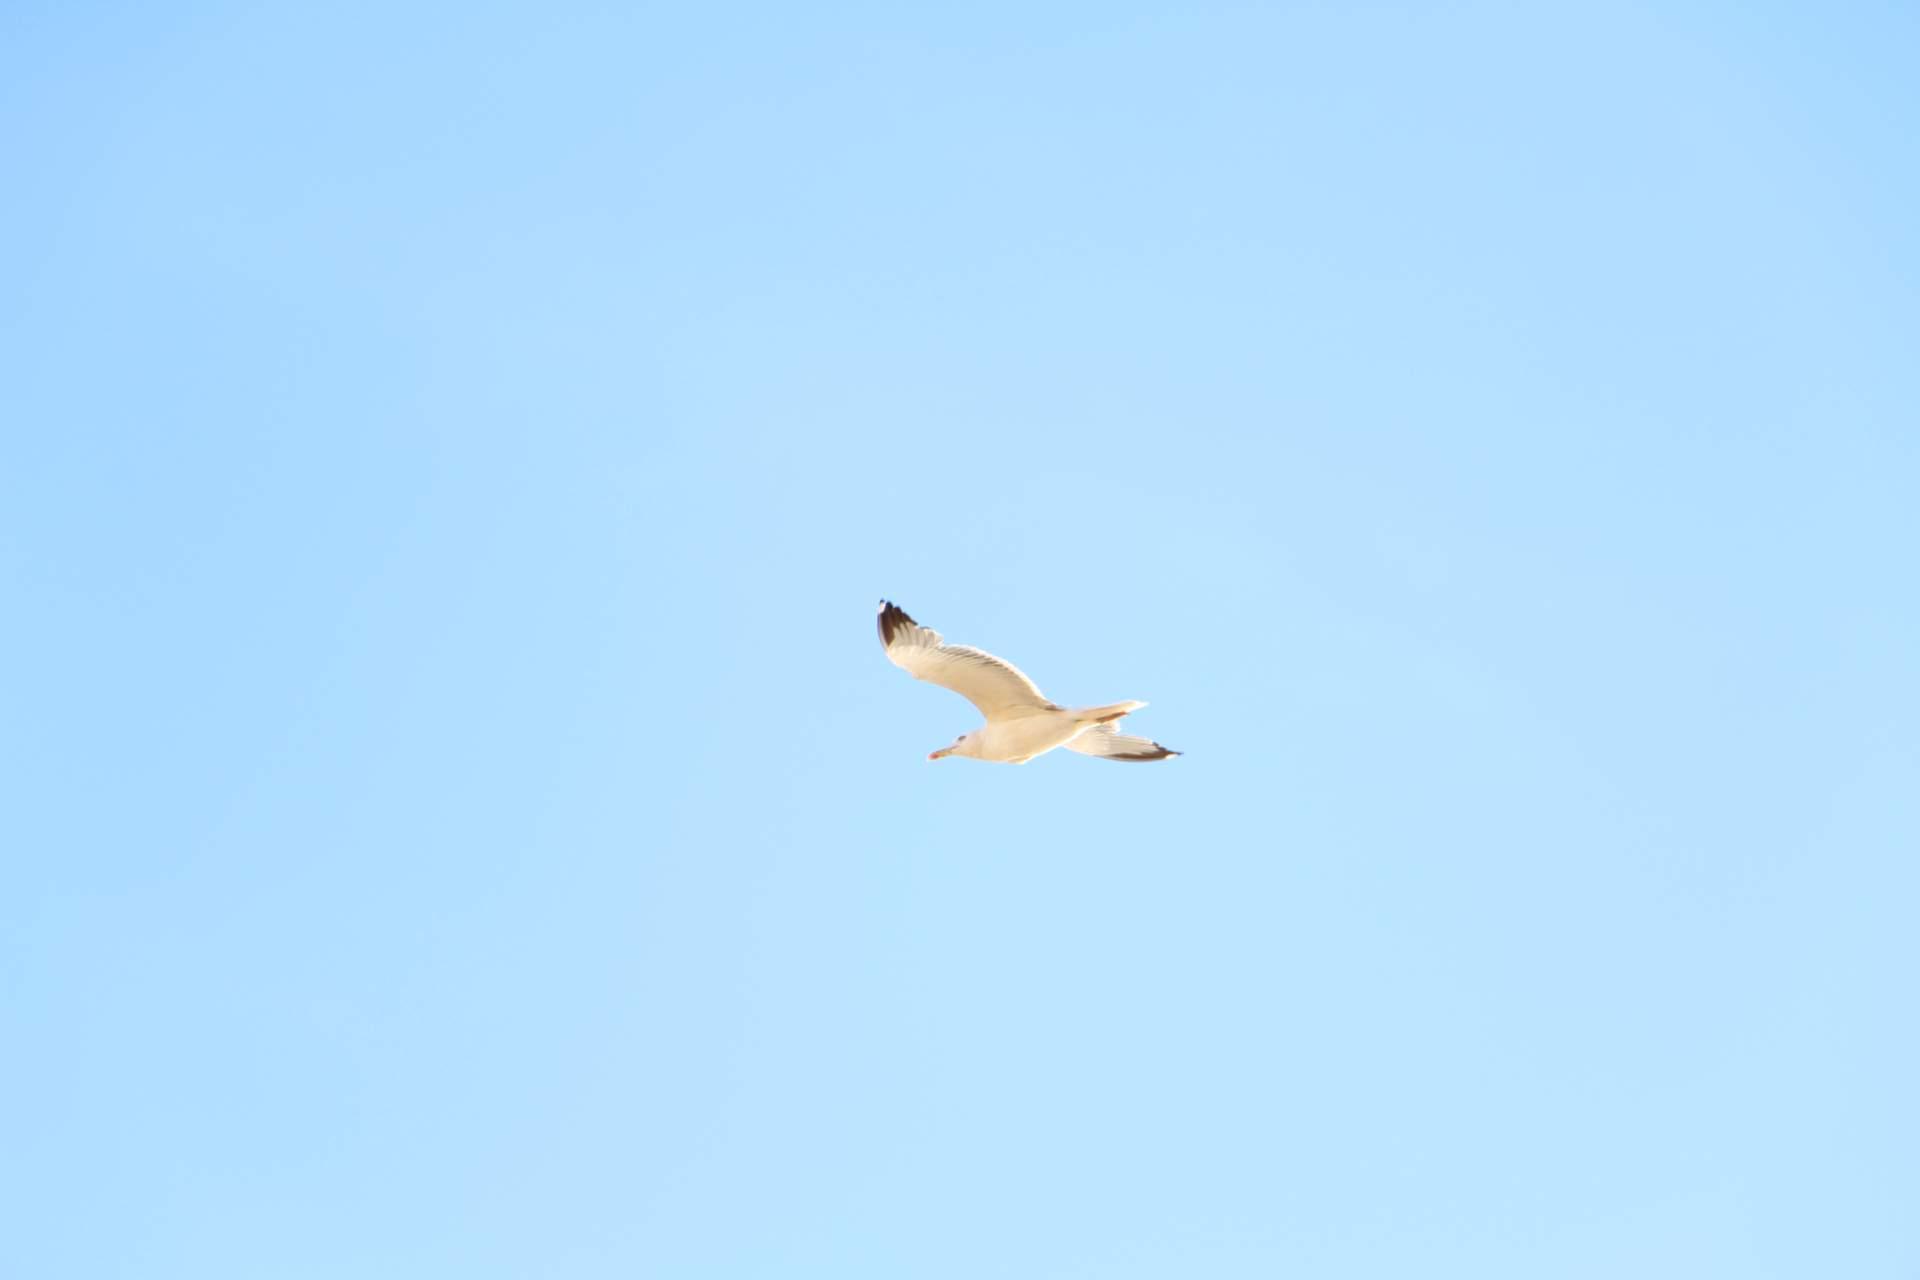 Möwe fliegt vorbei